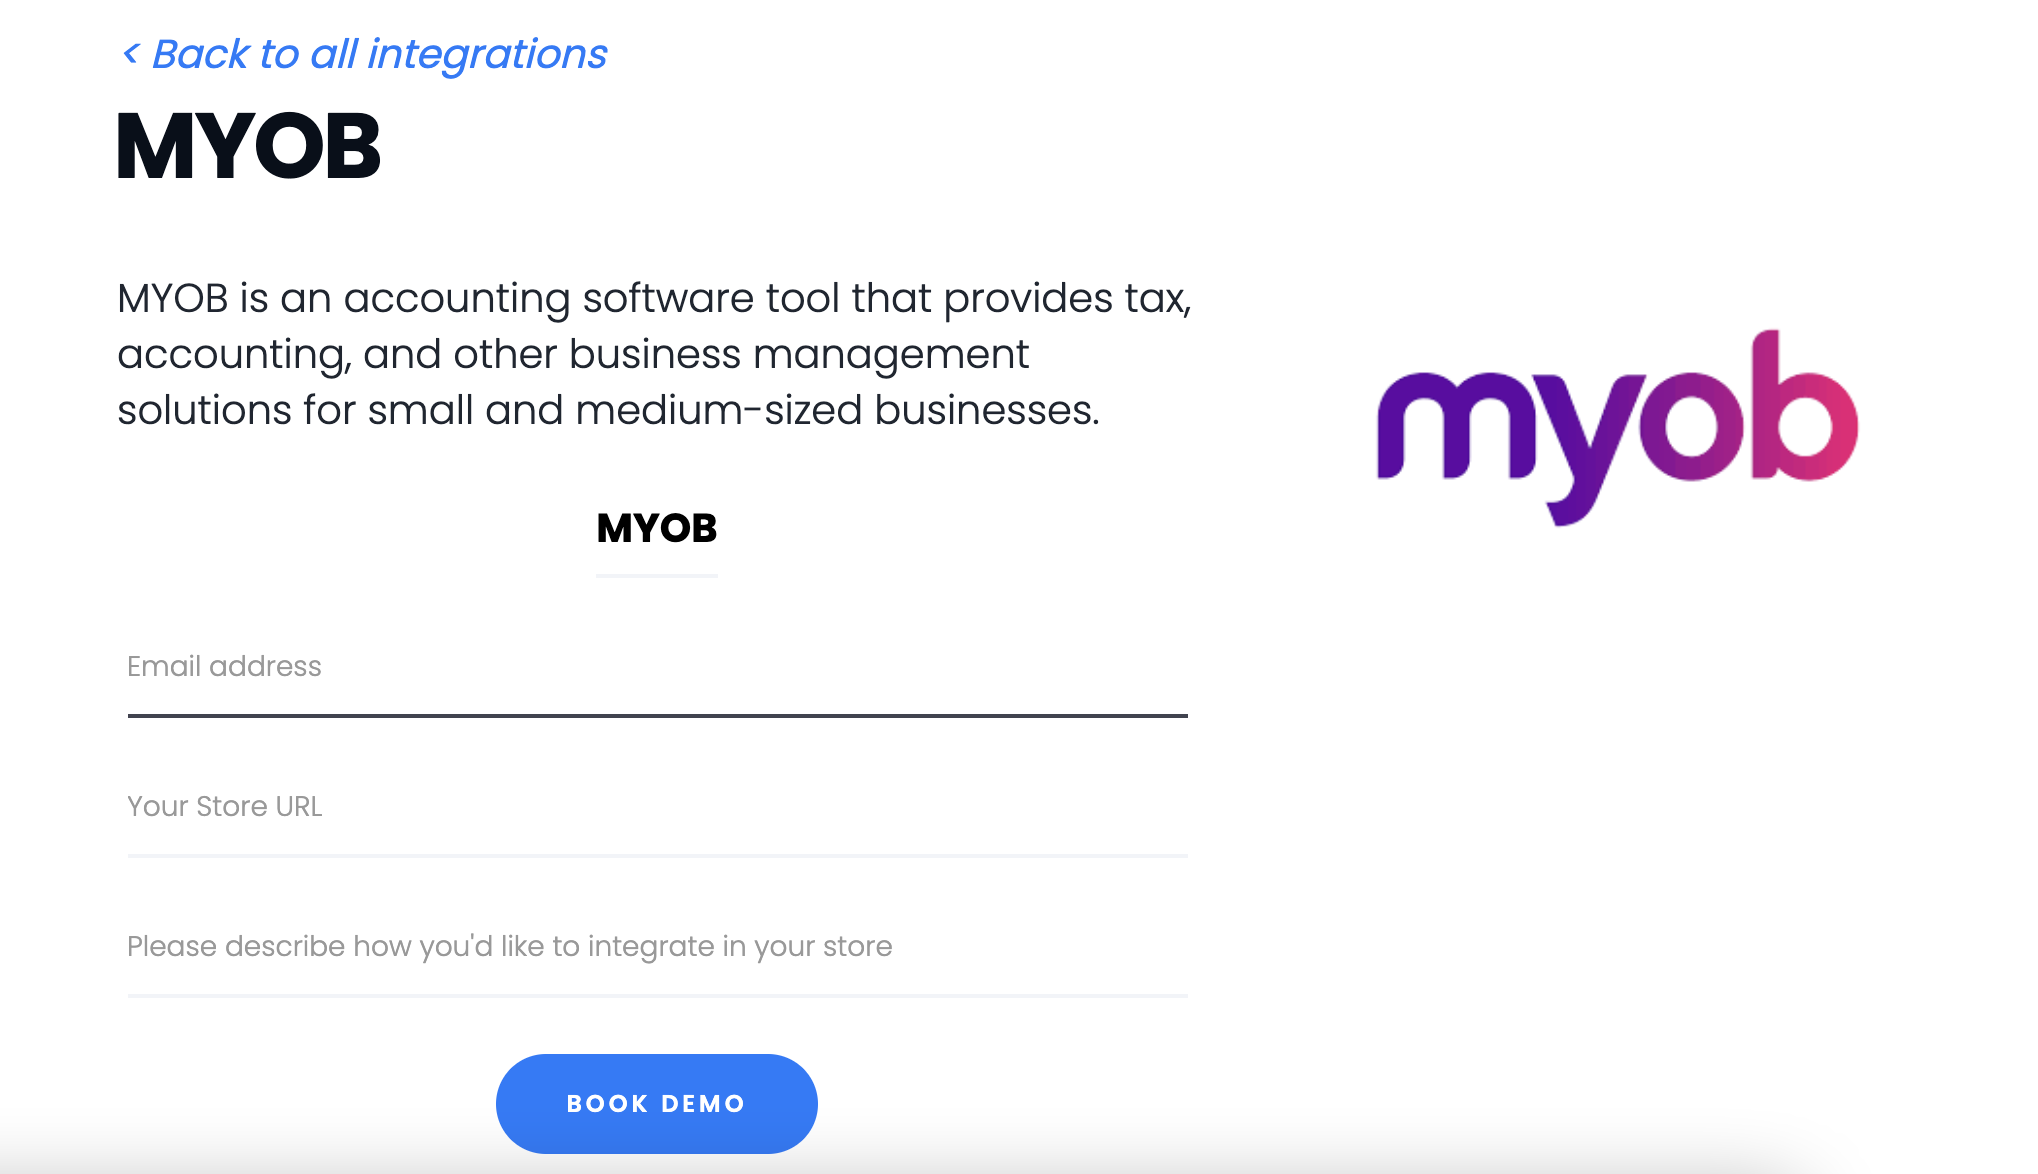 MYOB Integration Using Shypyard